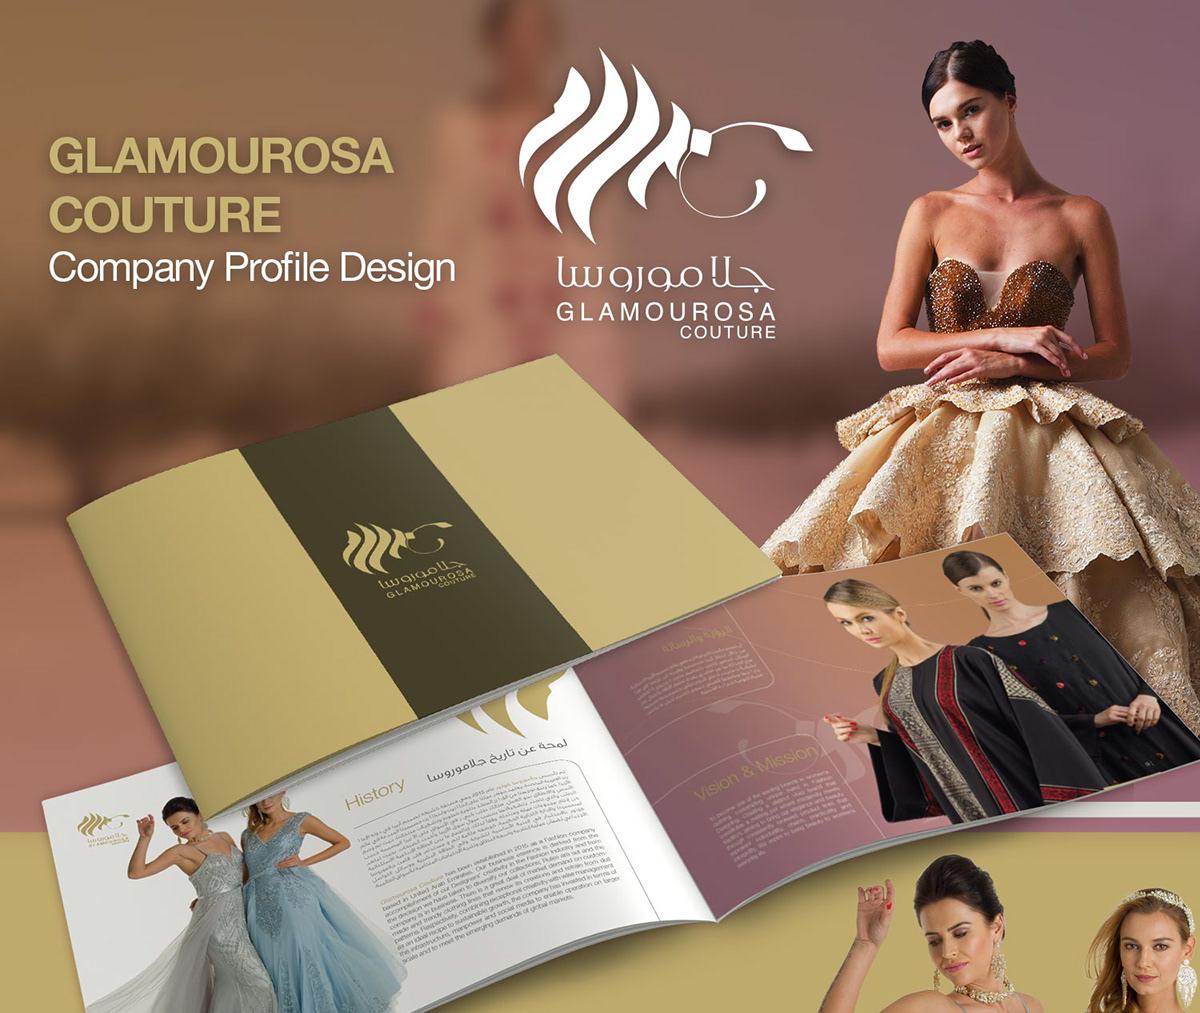 Glamourosa Couture Company Profile Design On Student Show